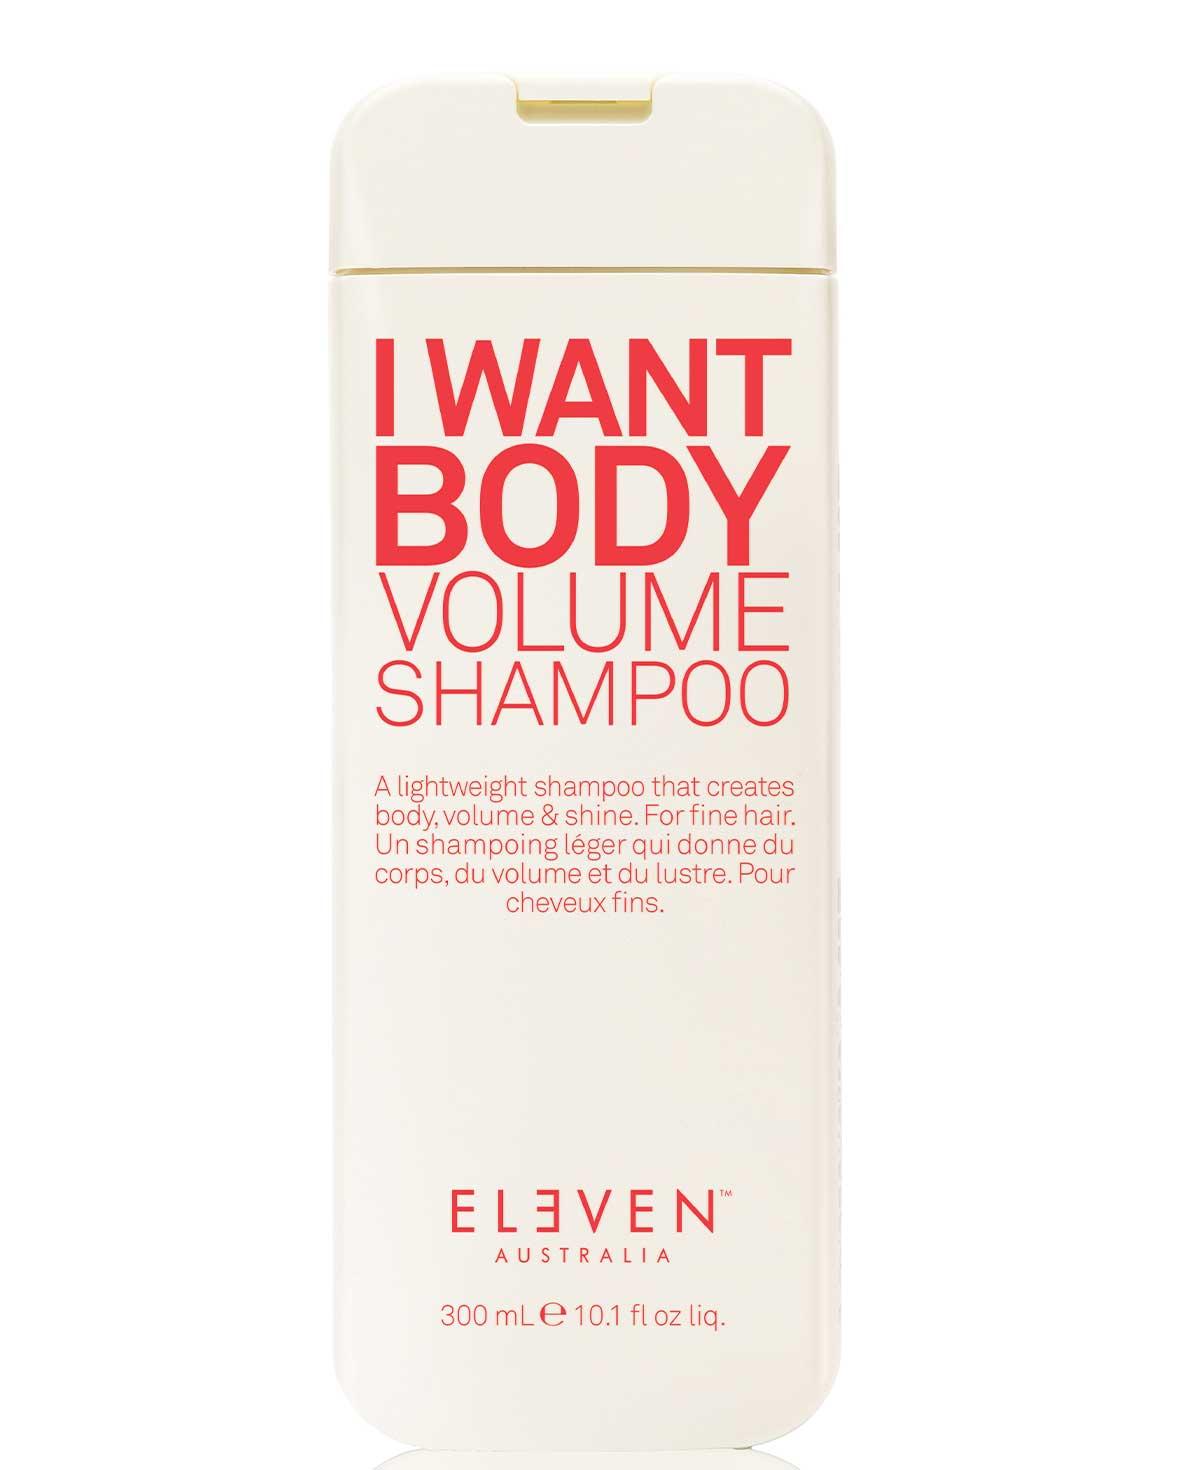 Eleven I Want Body Volume Shampoo 300ml